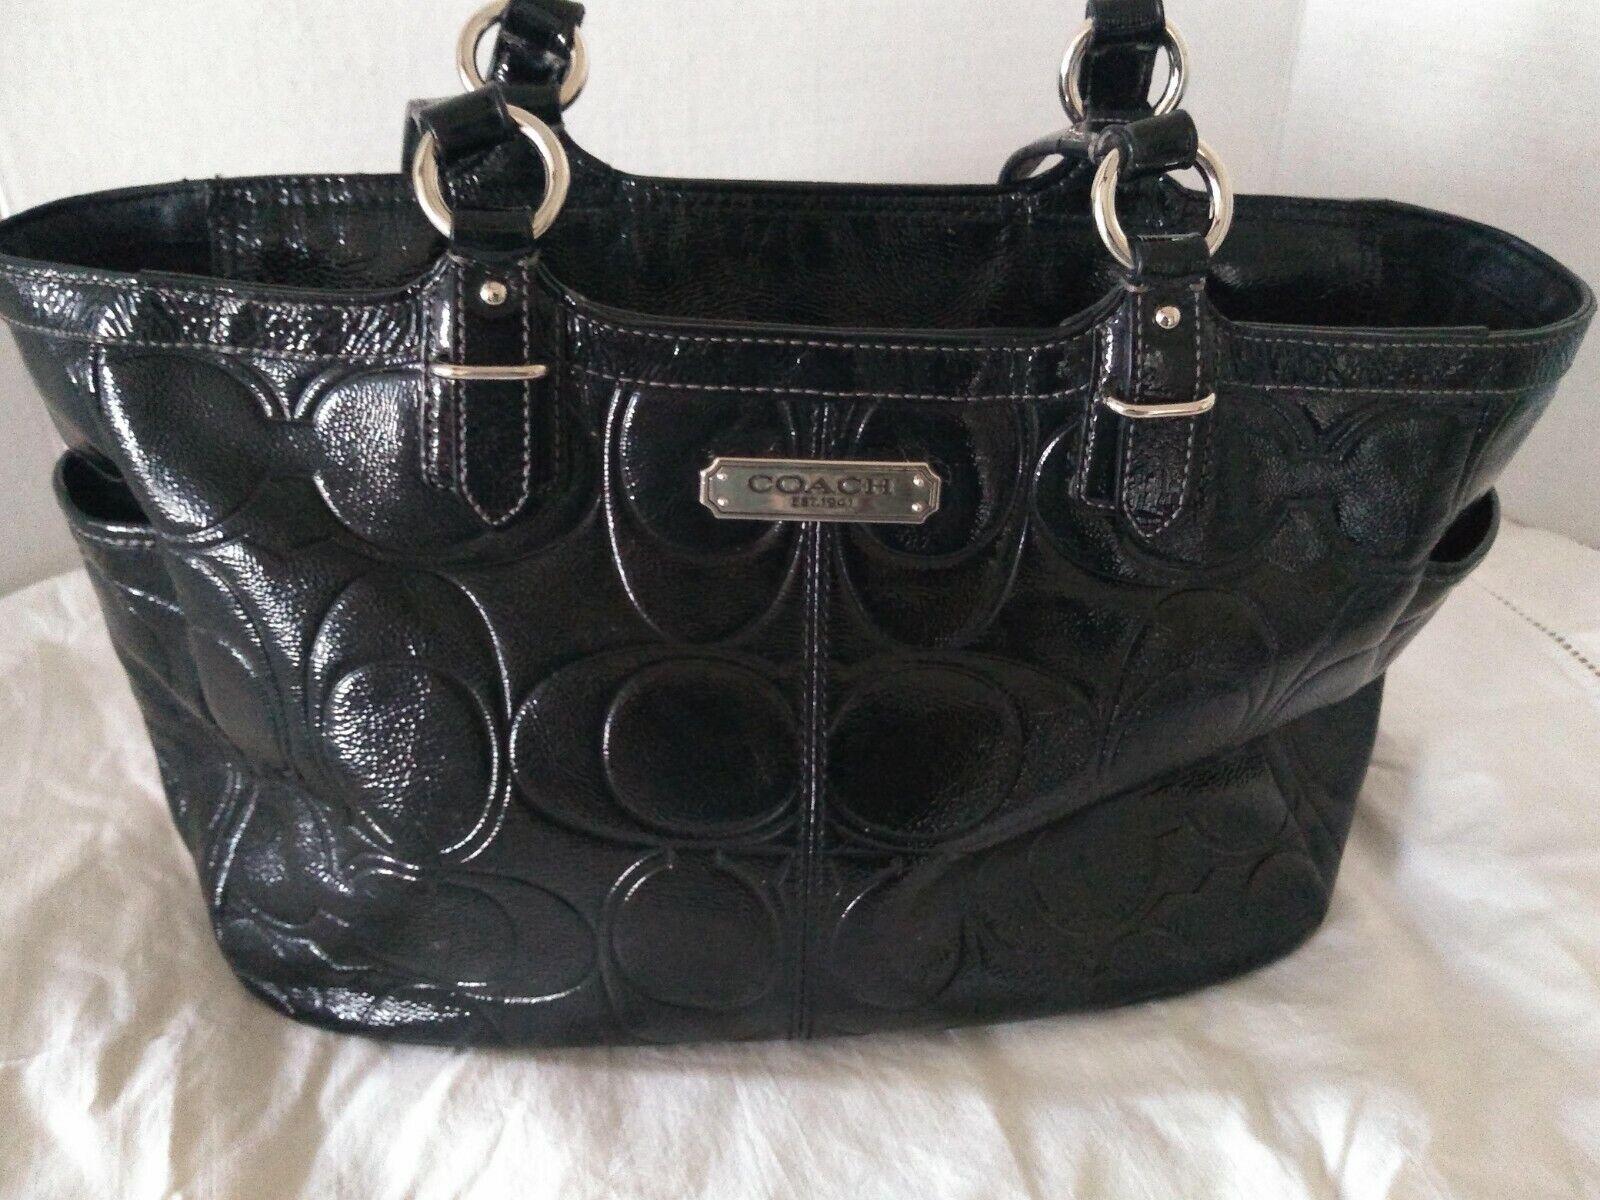 99da591a0a18 Coach Gallery Embossed Signature Patent Leather Zip Tote Bag F19462